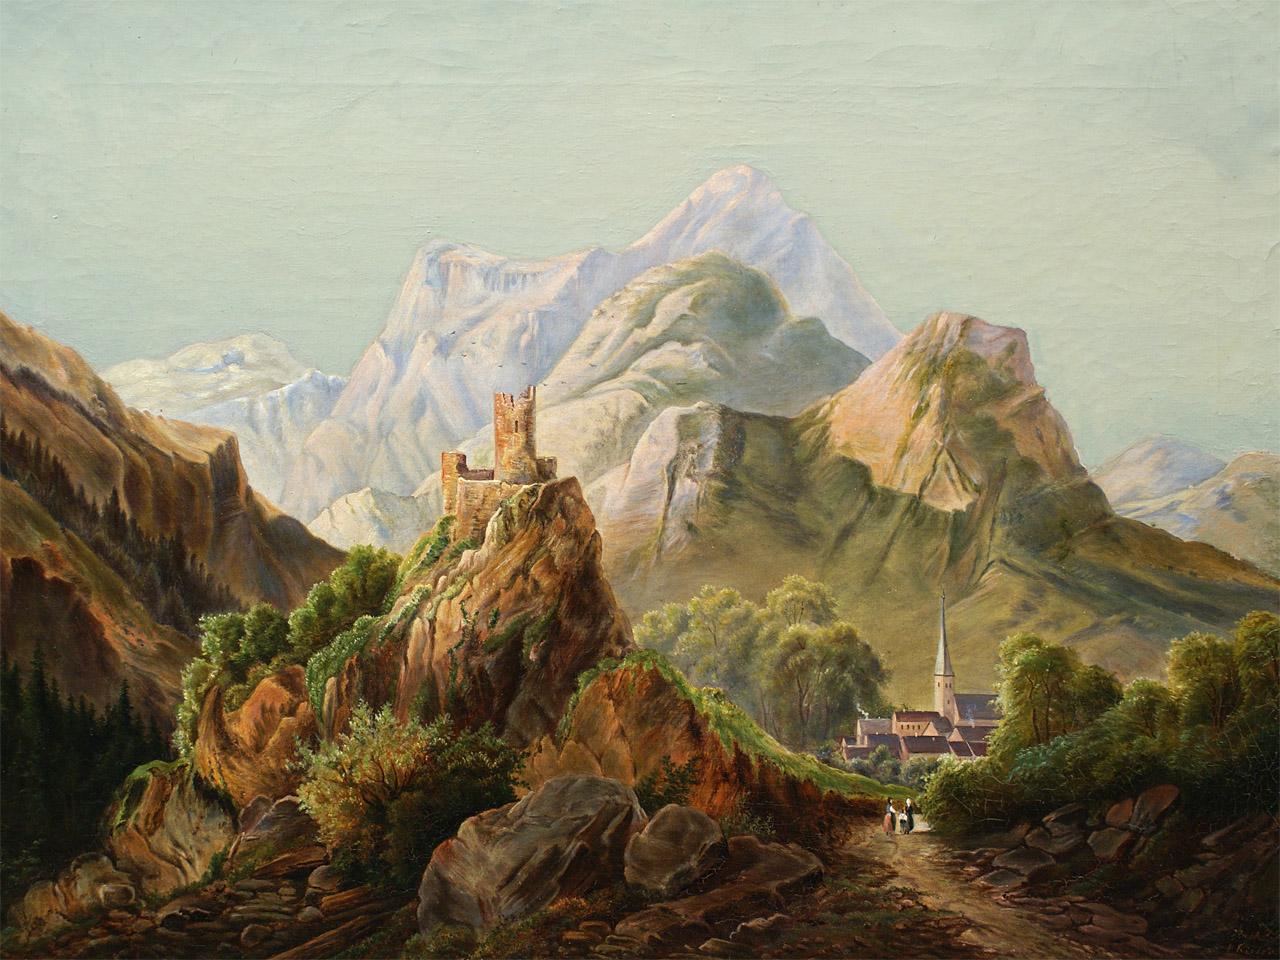 Landschaftsmalerei barock  G 114 Kieser, A.: Landschaftsmalerei, Ölgemälde, 1897 ...